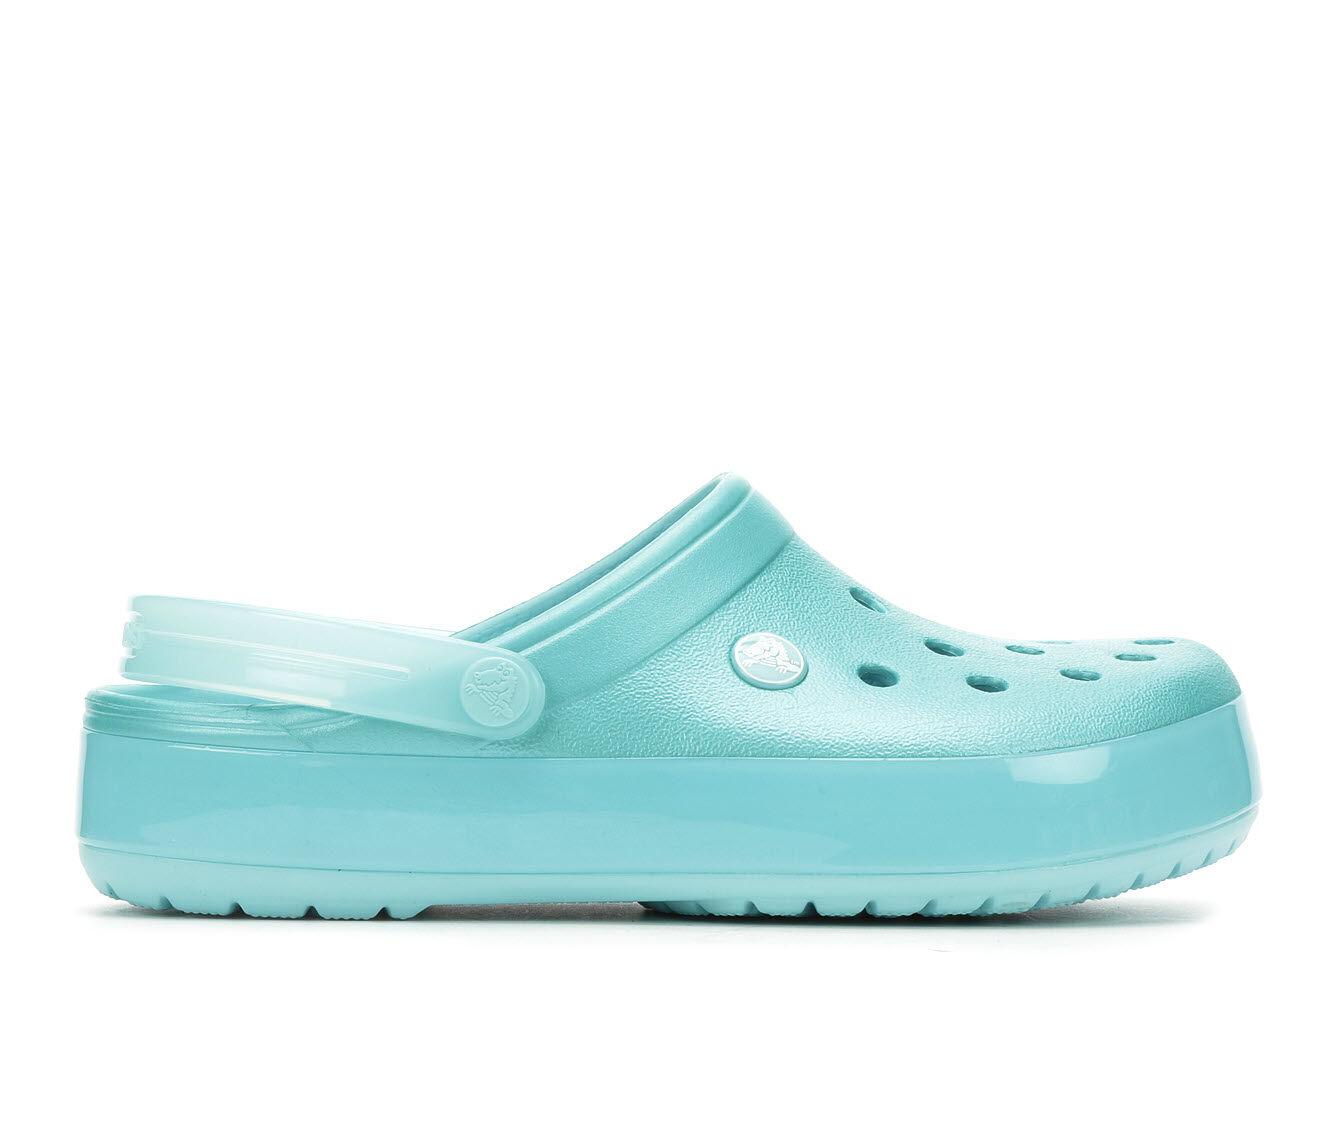 Women's Crocs Crocband Ice Clog Ice Blue